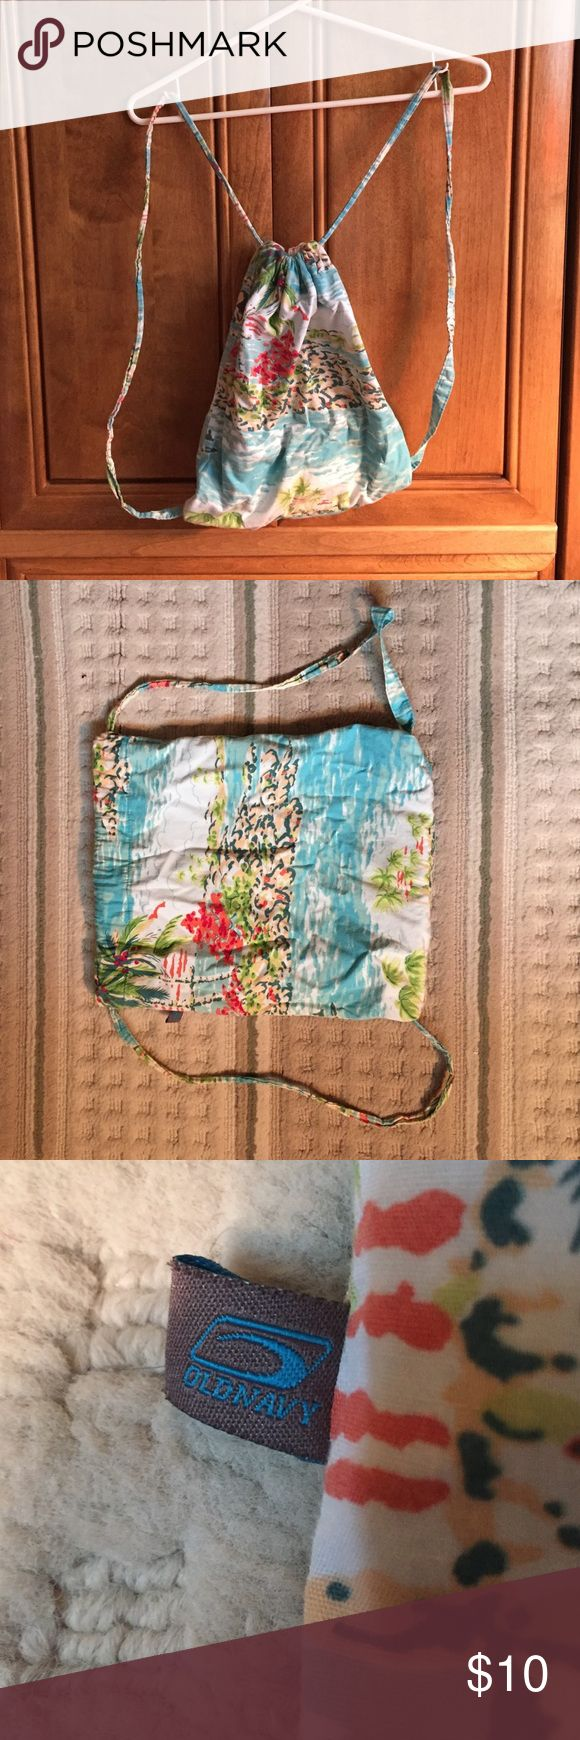 Beach cinch sack Beach print cinch sack from old navy Old Navy Bags Backpacks